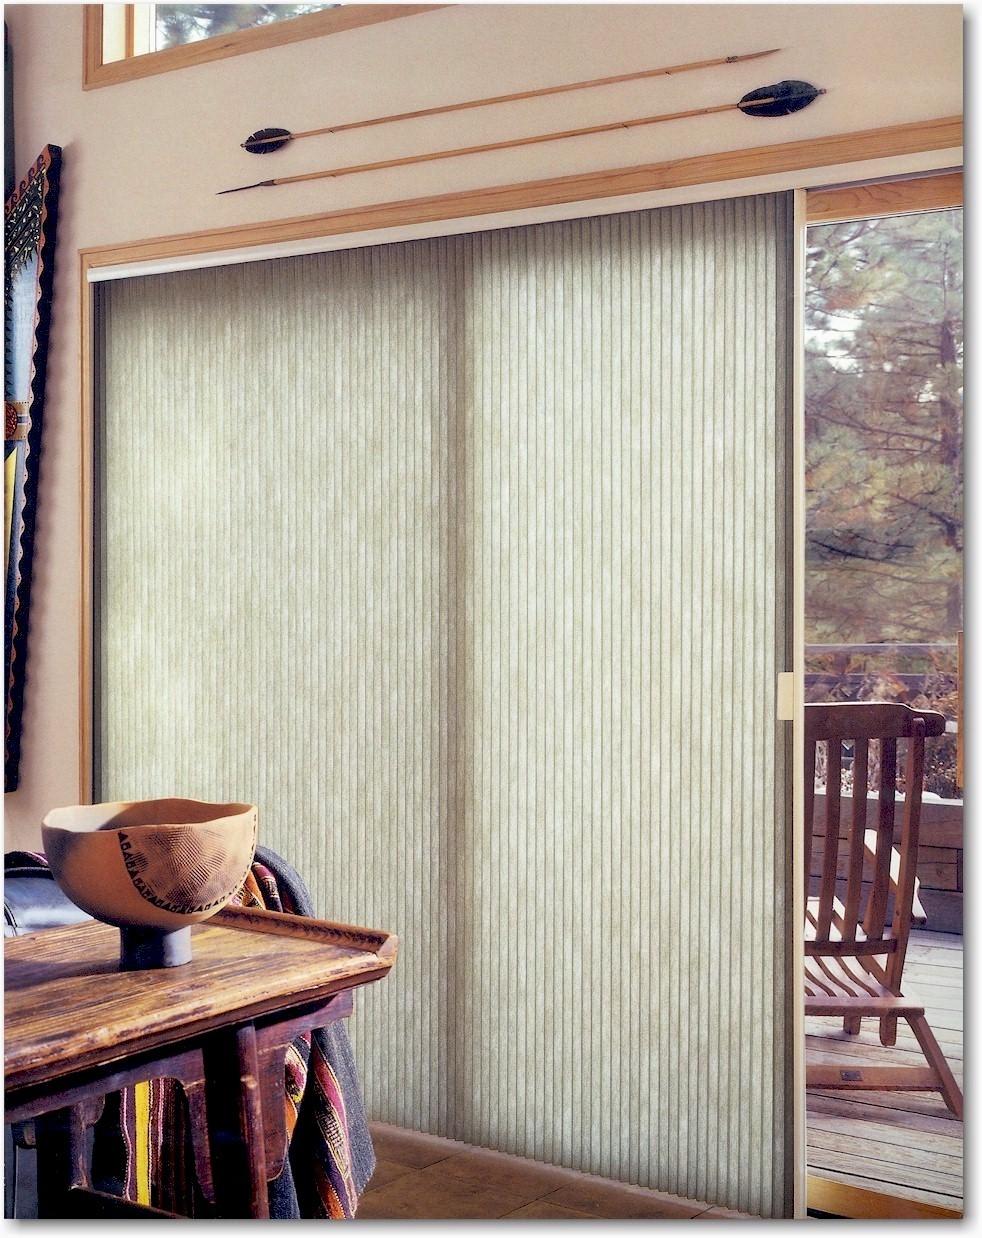 Vertical Honeycomb Shades For Sliding Glass Doorsvertical cellular shades and blinds blinds express